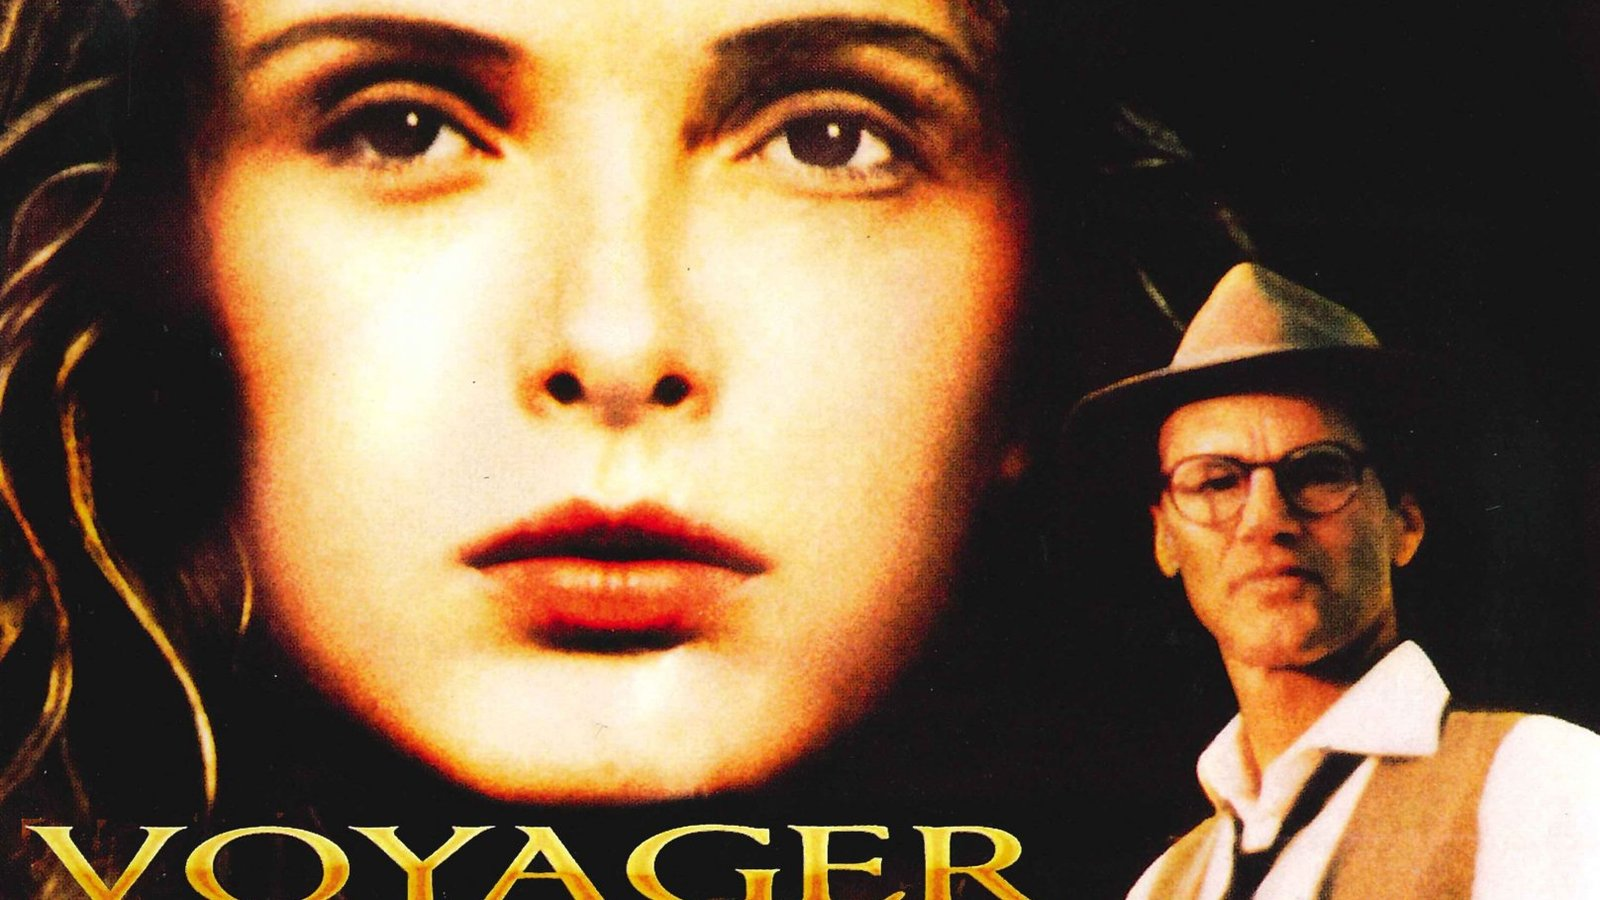 Voyager - Homo Faber